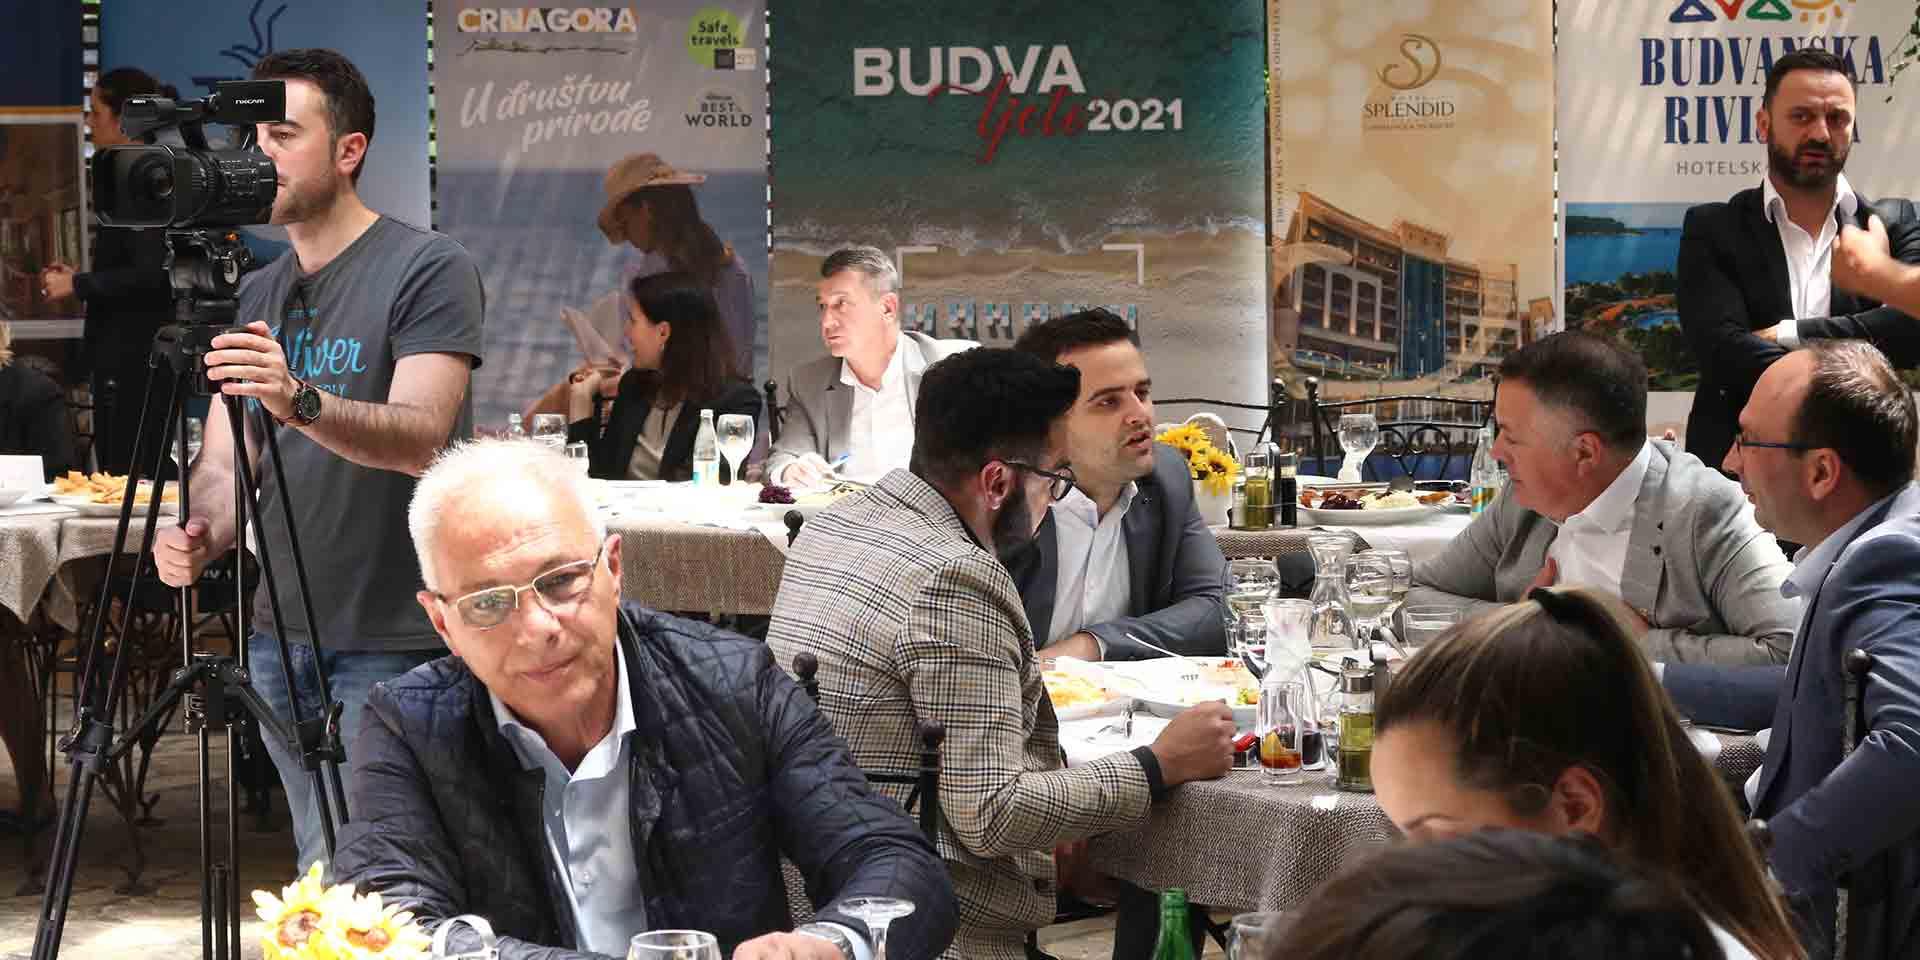 budva-old-town budva-restaurants budva-apartments budva-Montenegro budva-camps